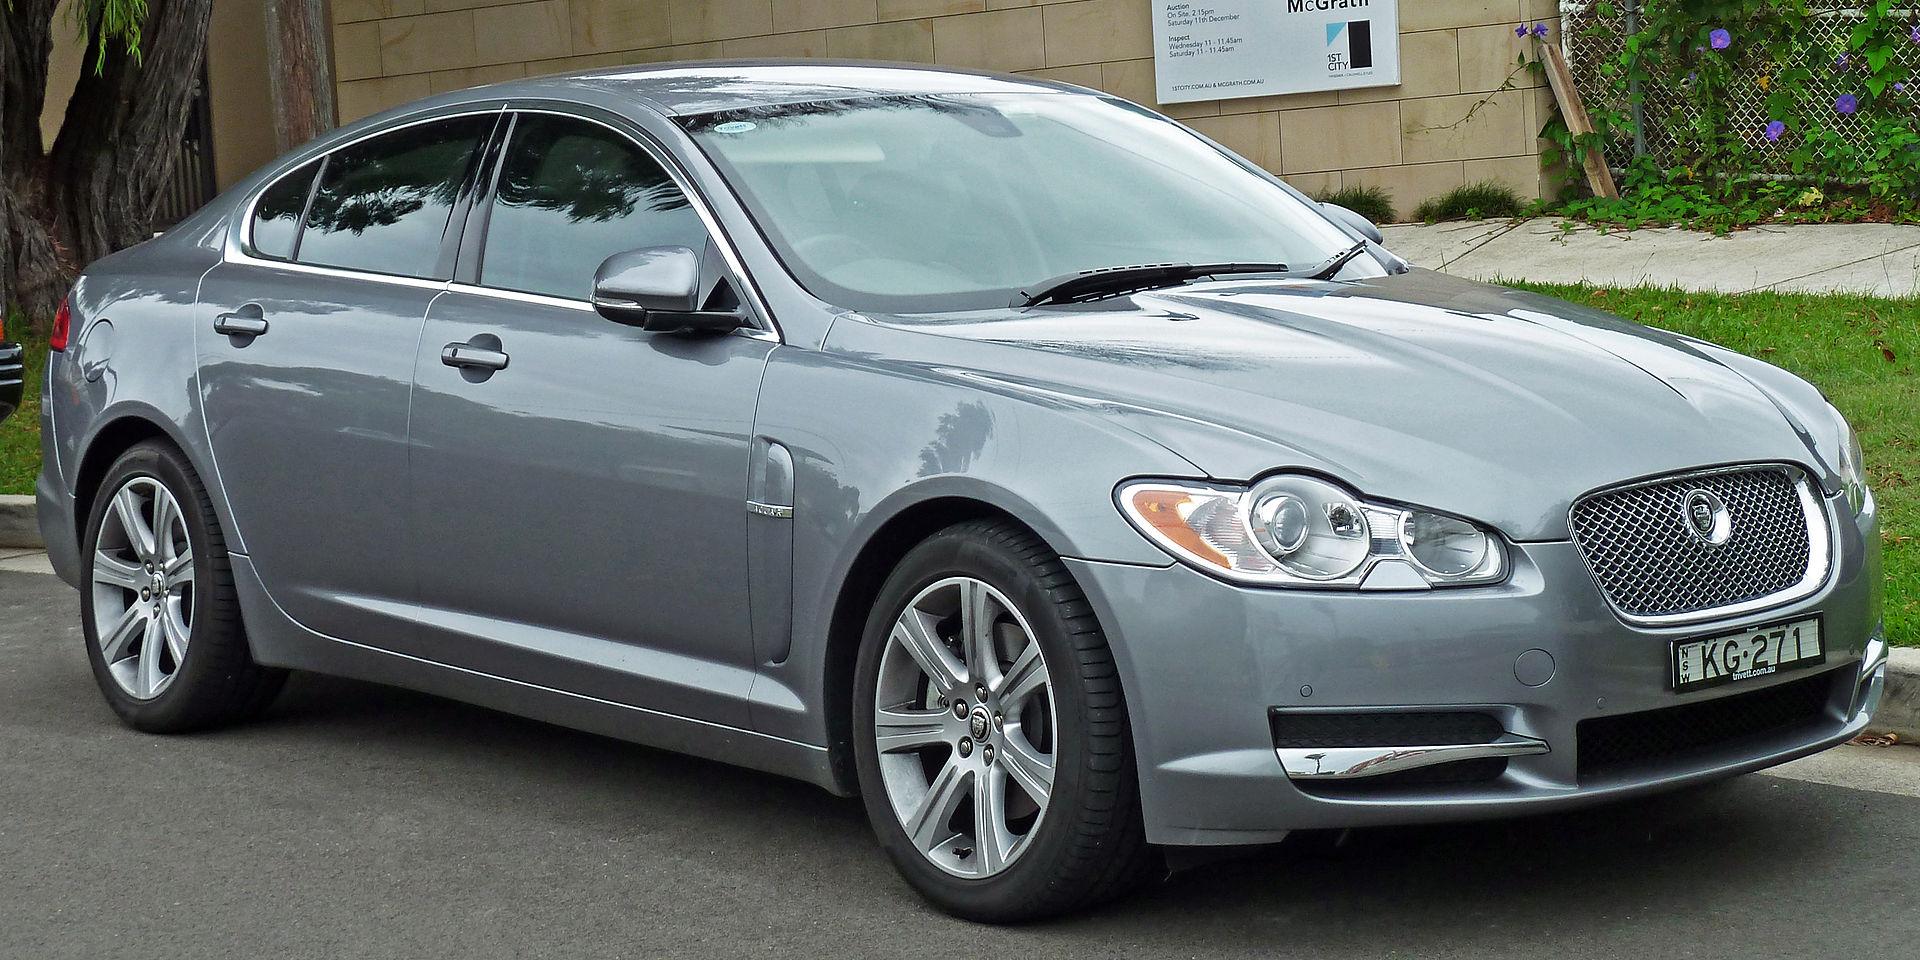 Vehicle - Vehicle - Automobile - Jaguar - XF